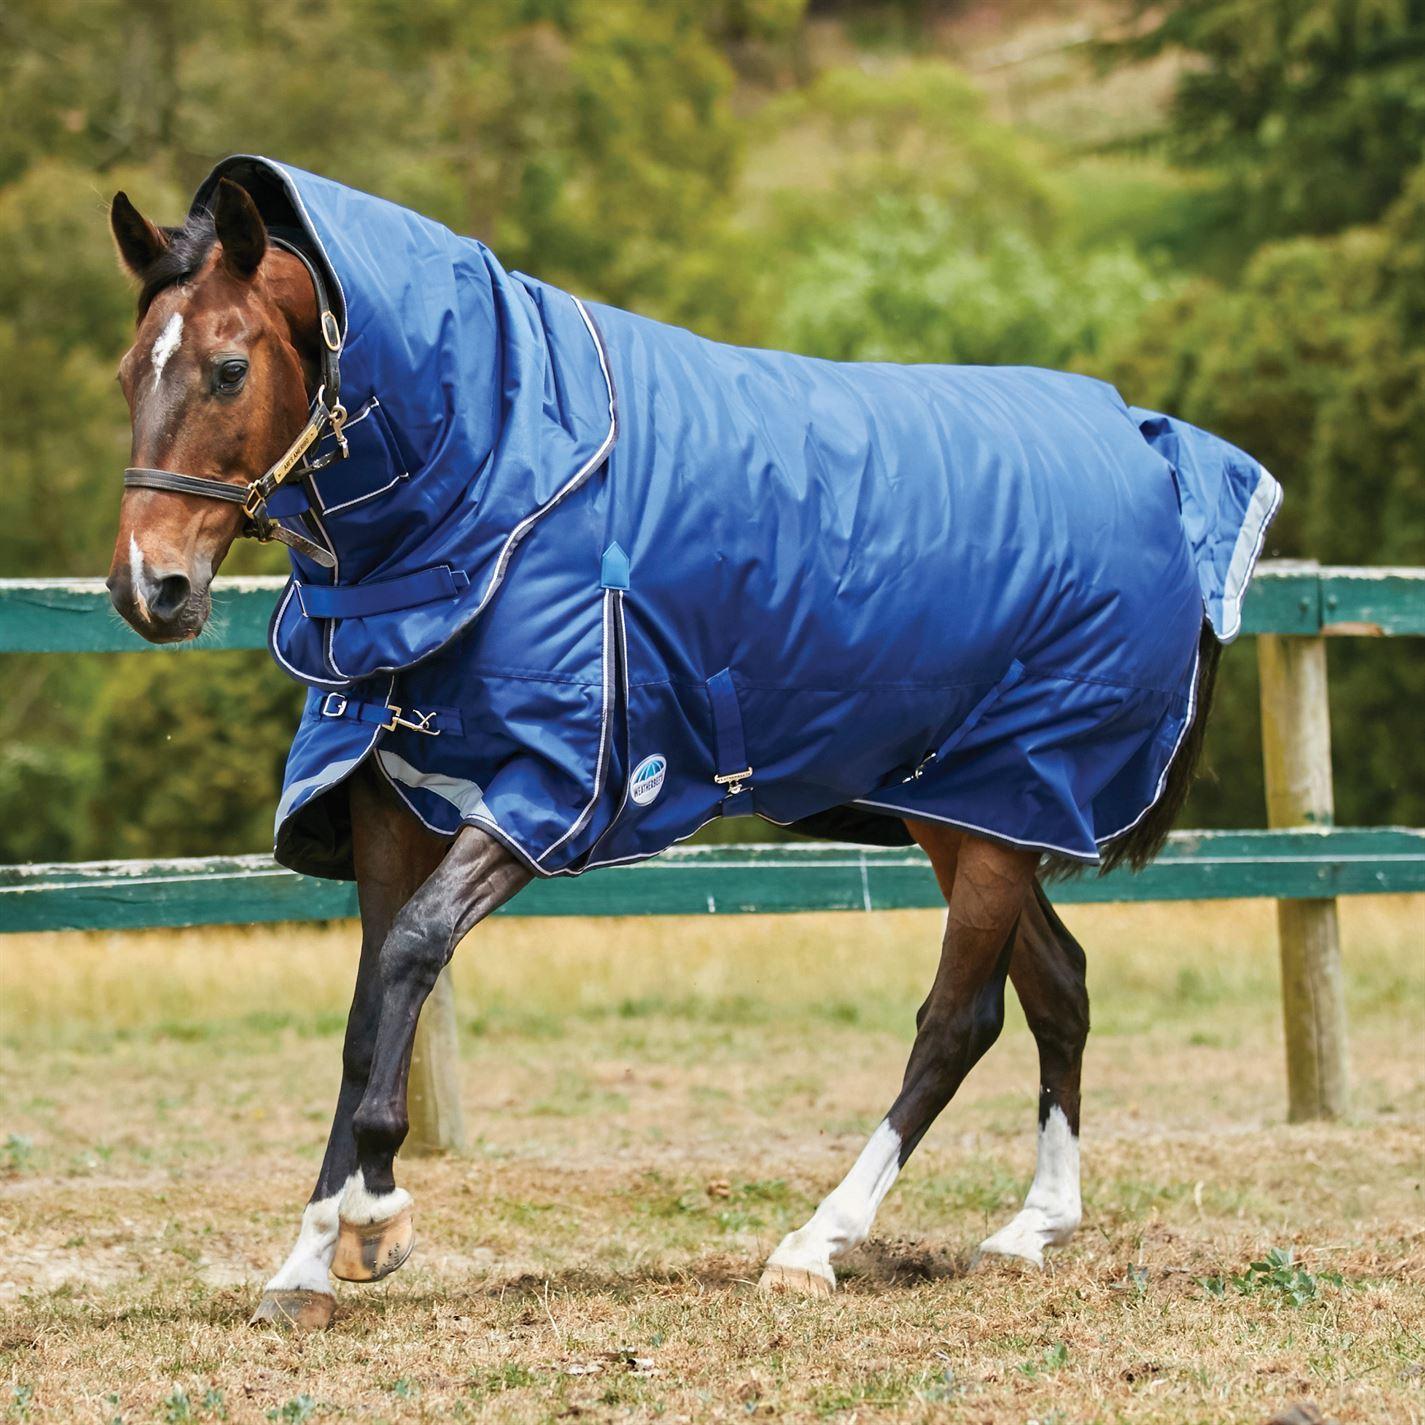 Weatherbeeta Unisex ComFiTec ComFiTec Unisex Ultra Tough Heavy Horse Rug Waterproof Breathable 491130